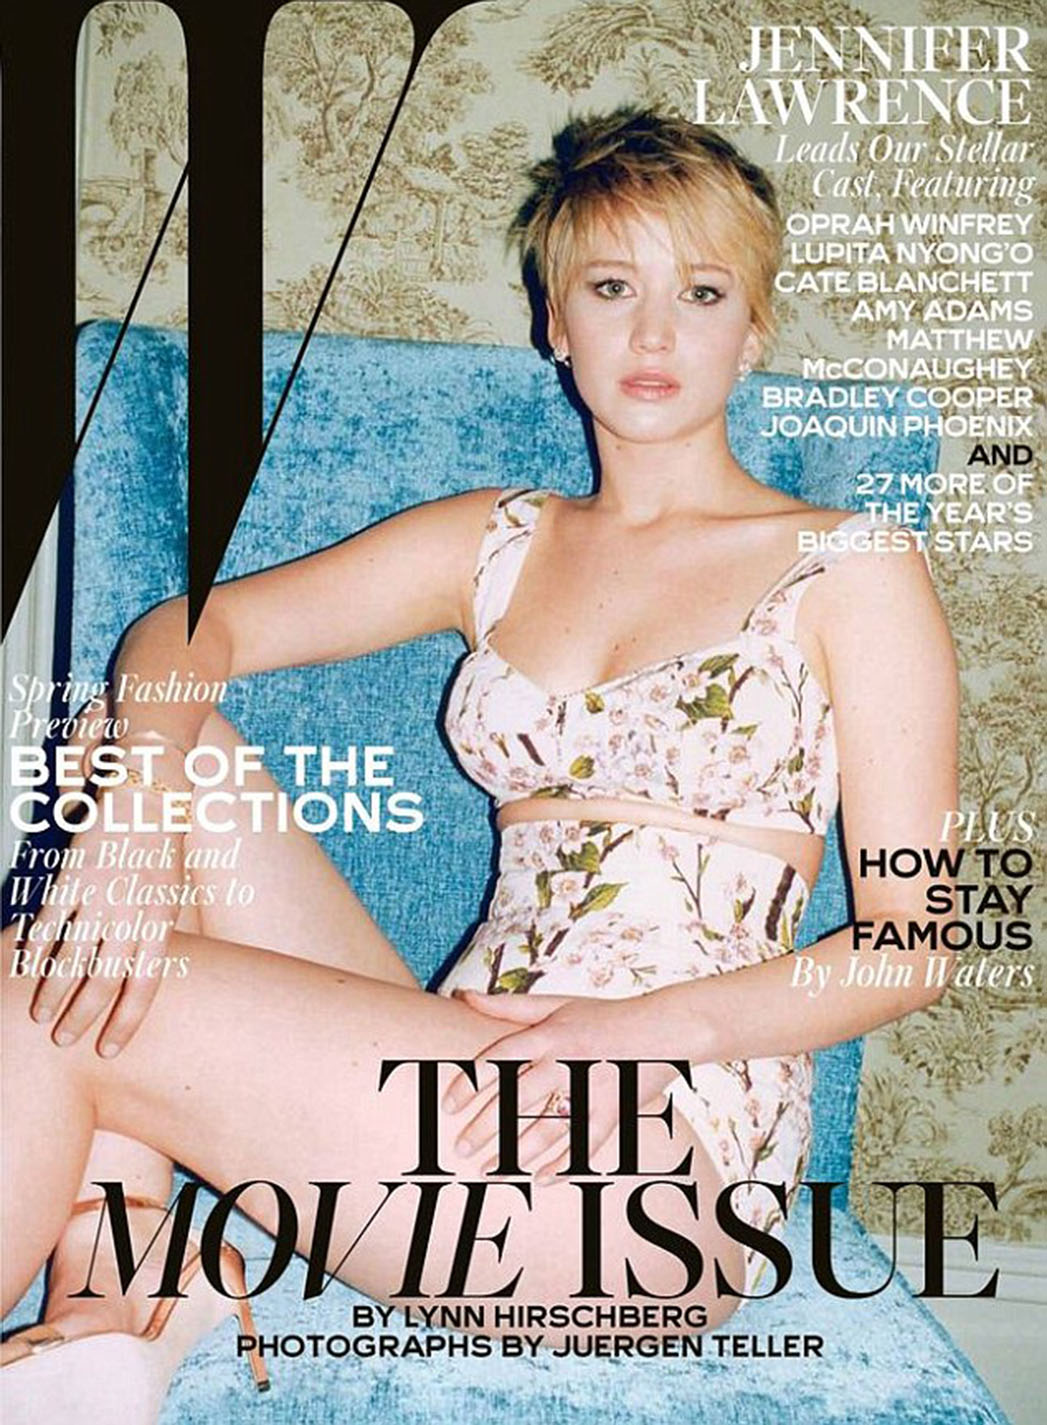 Jennifer Lawrence W Magazine Cover Large - P 2013